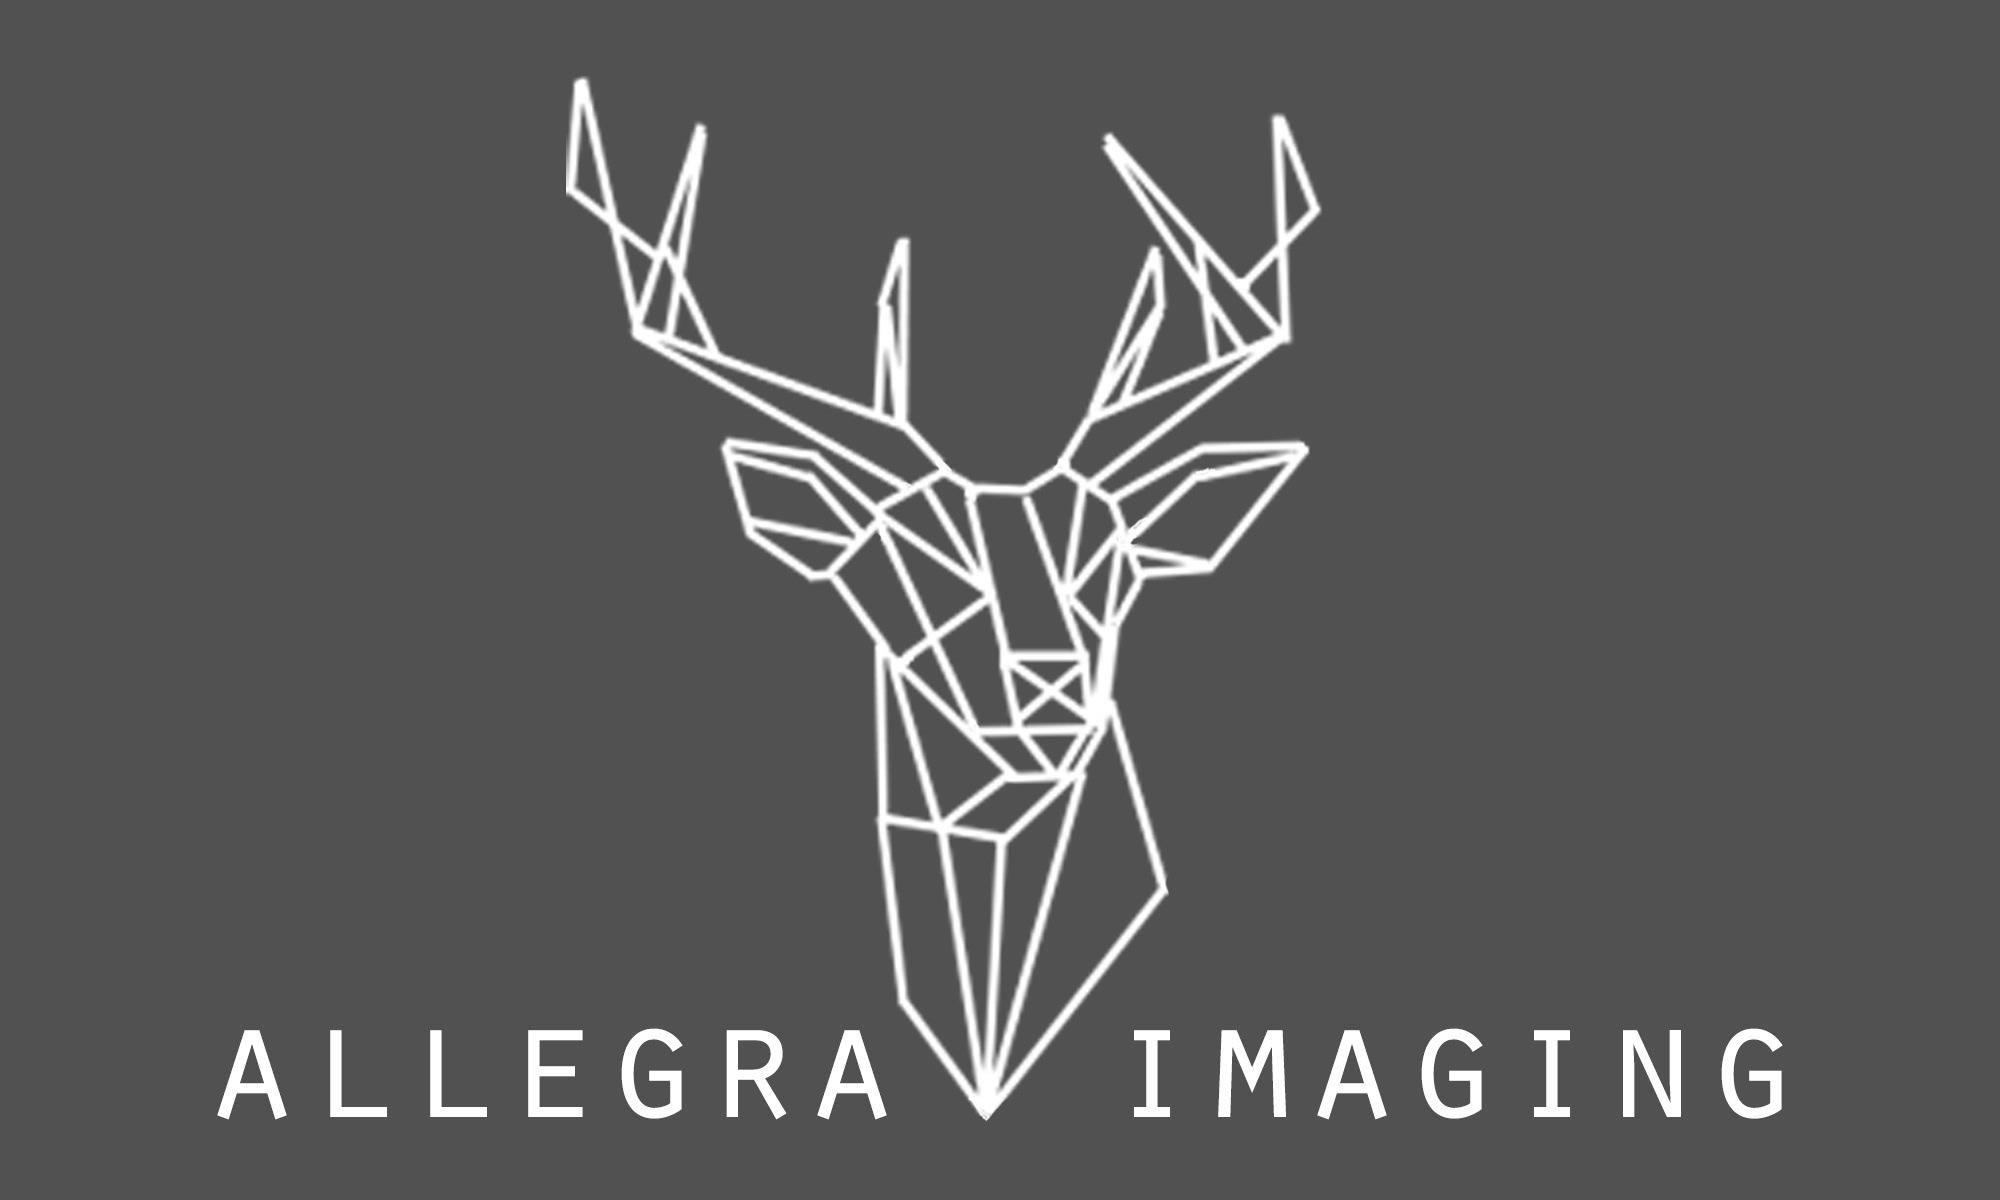 Allegra Imaging